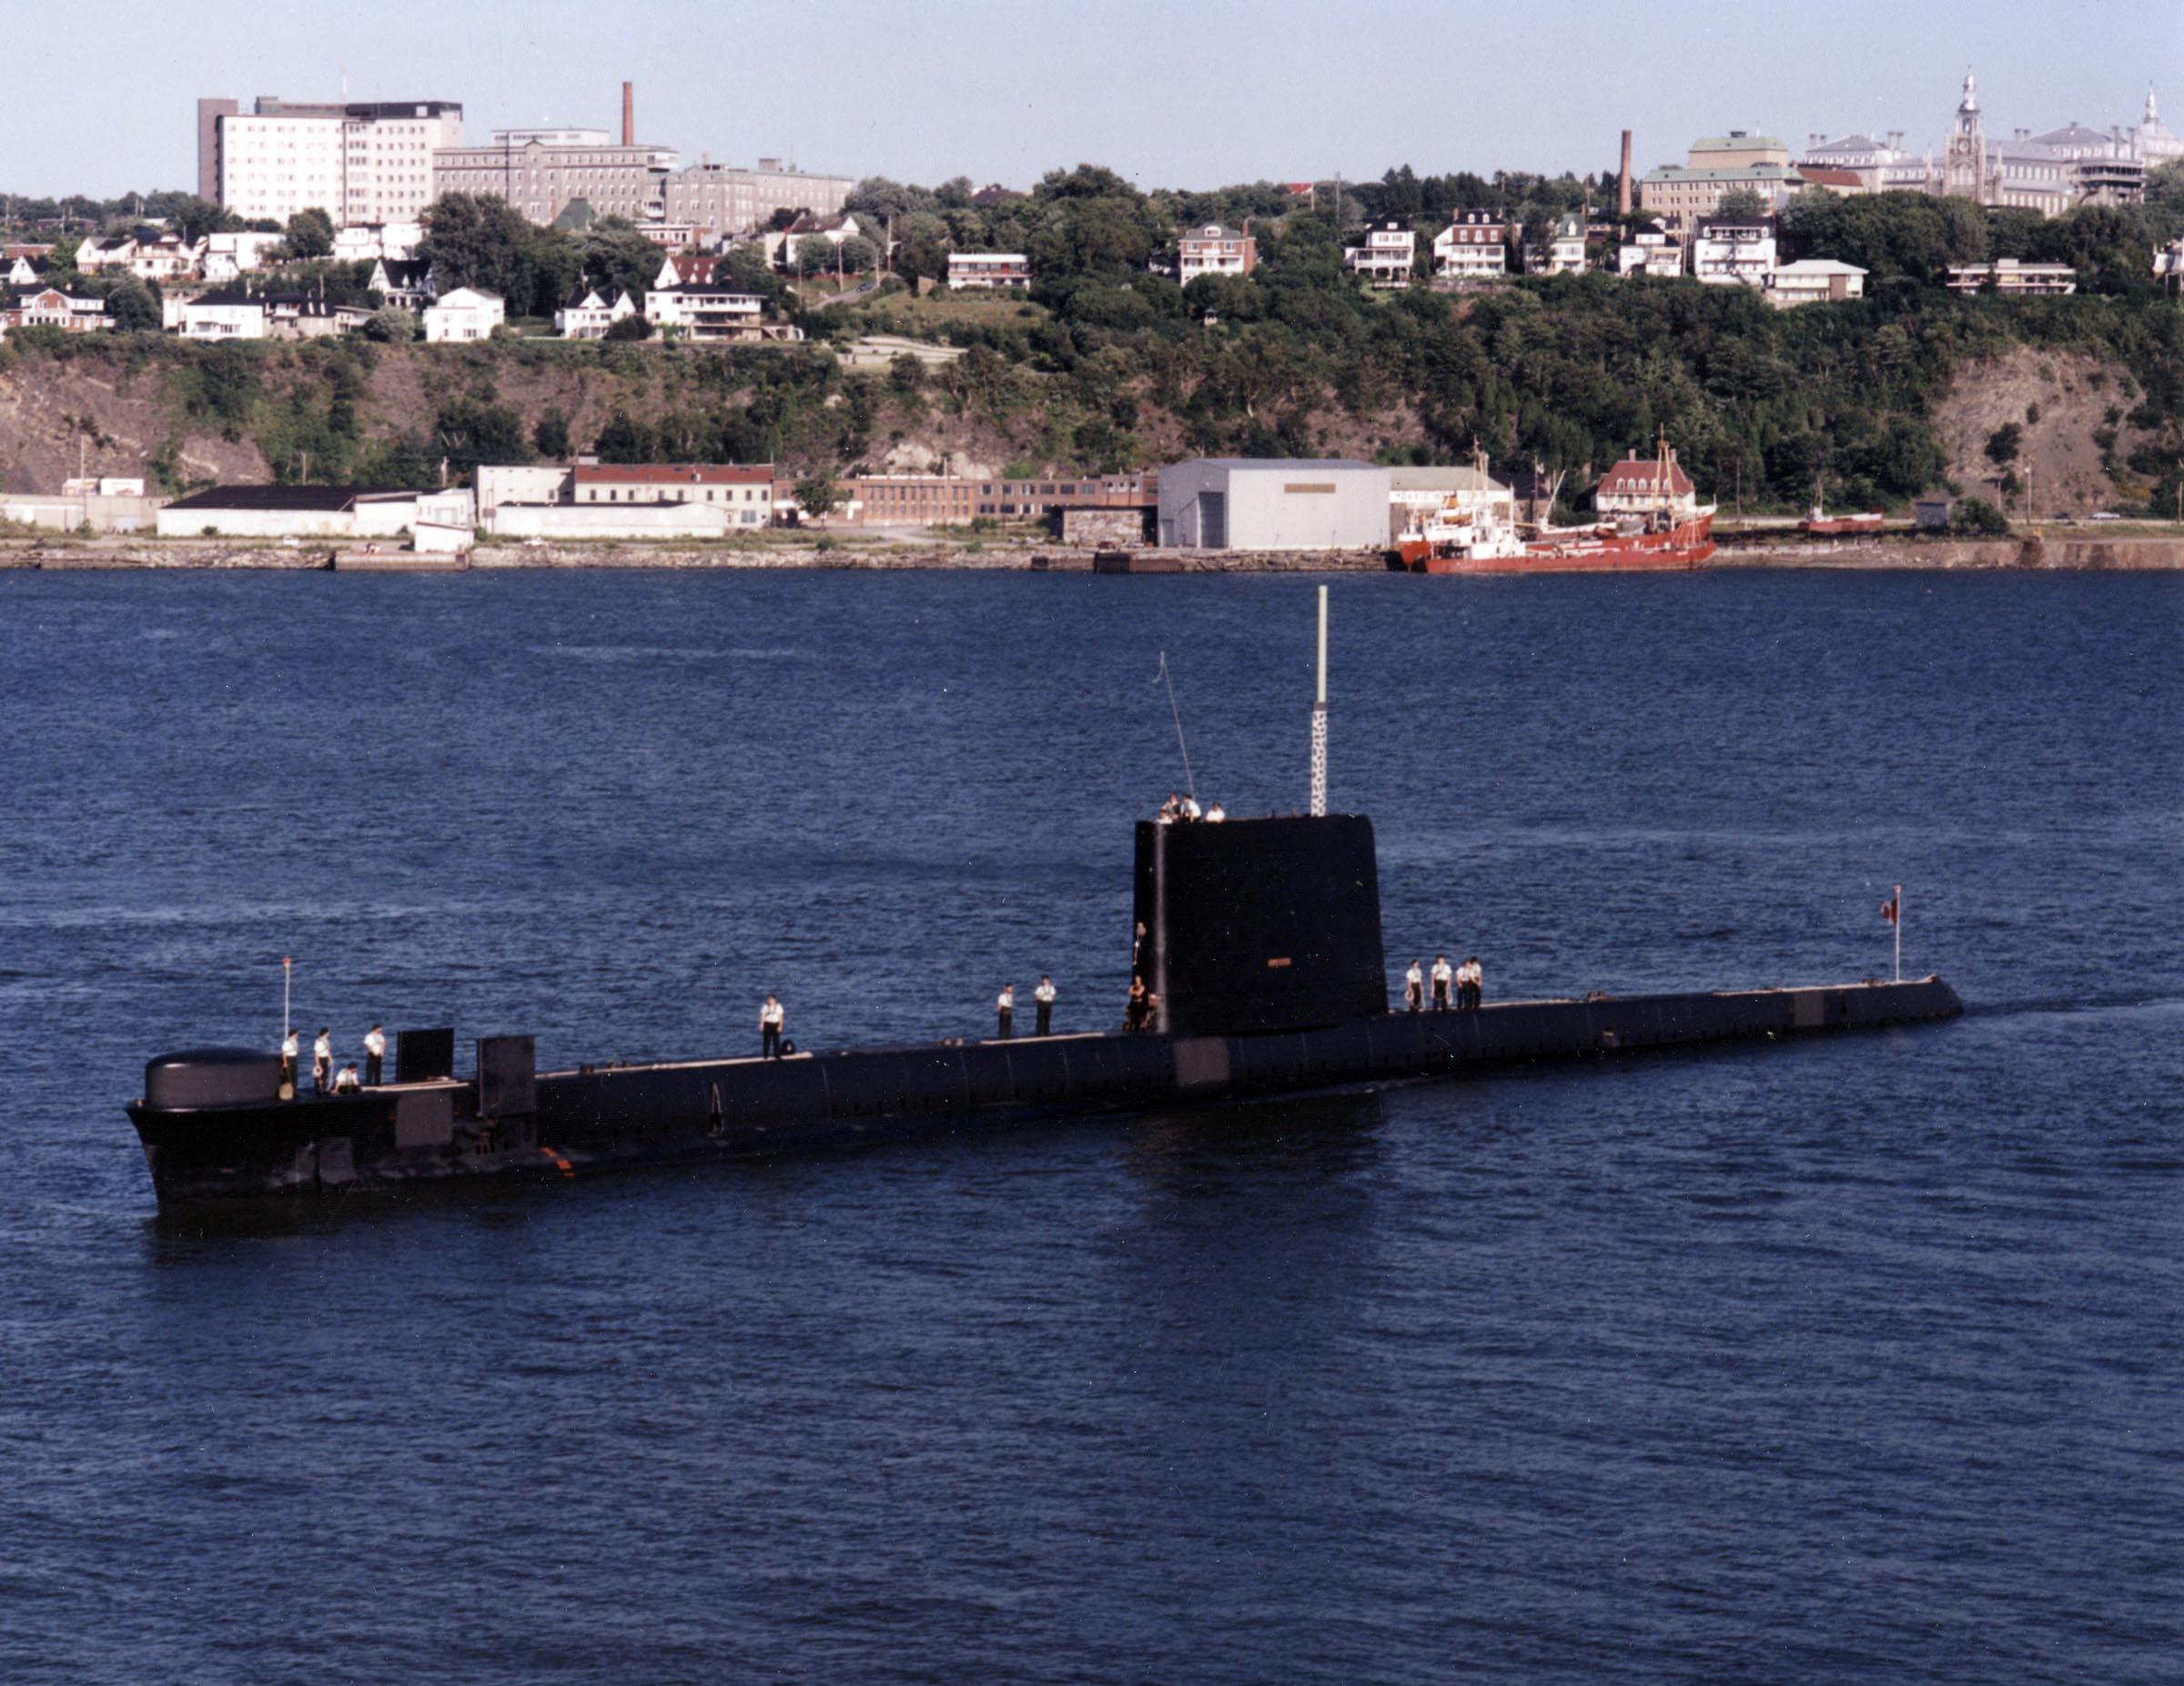 HMCS ONONDAGA